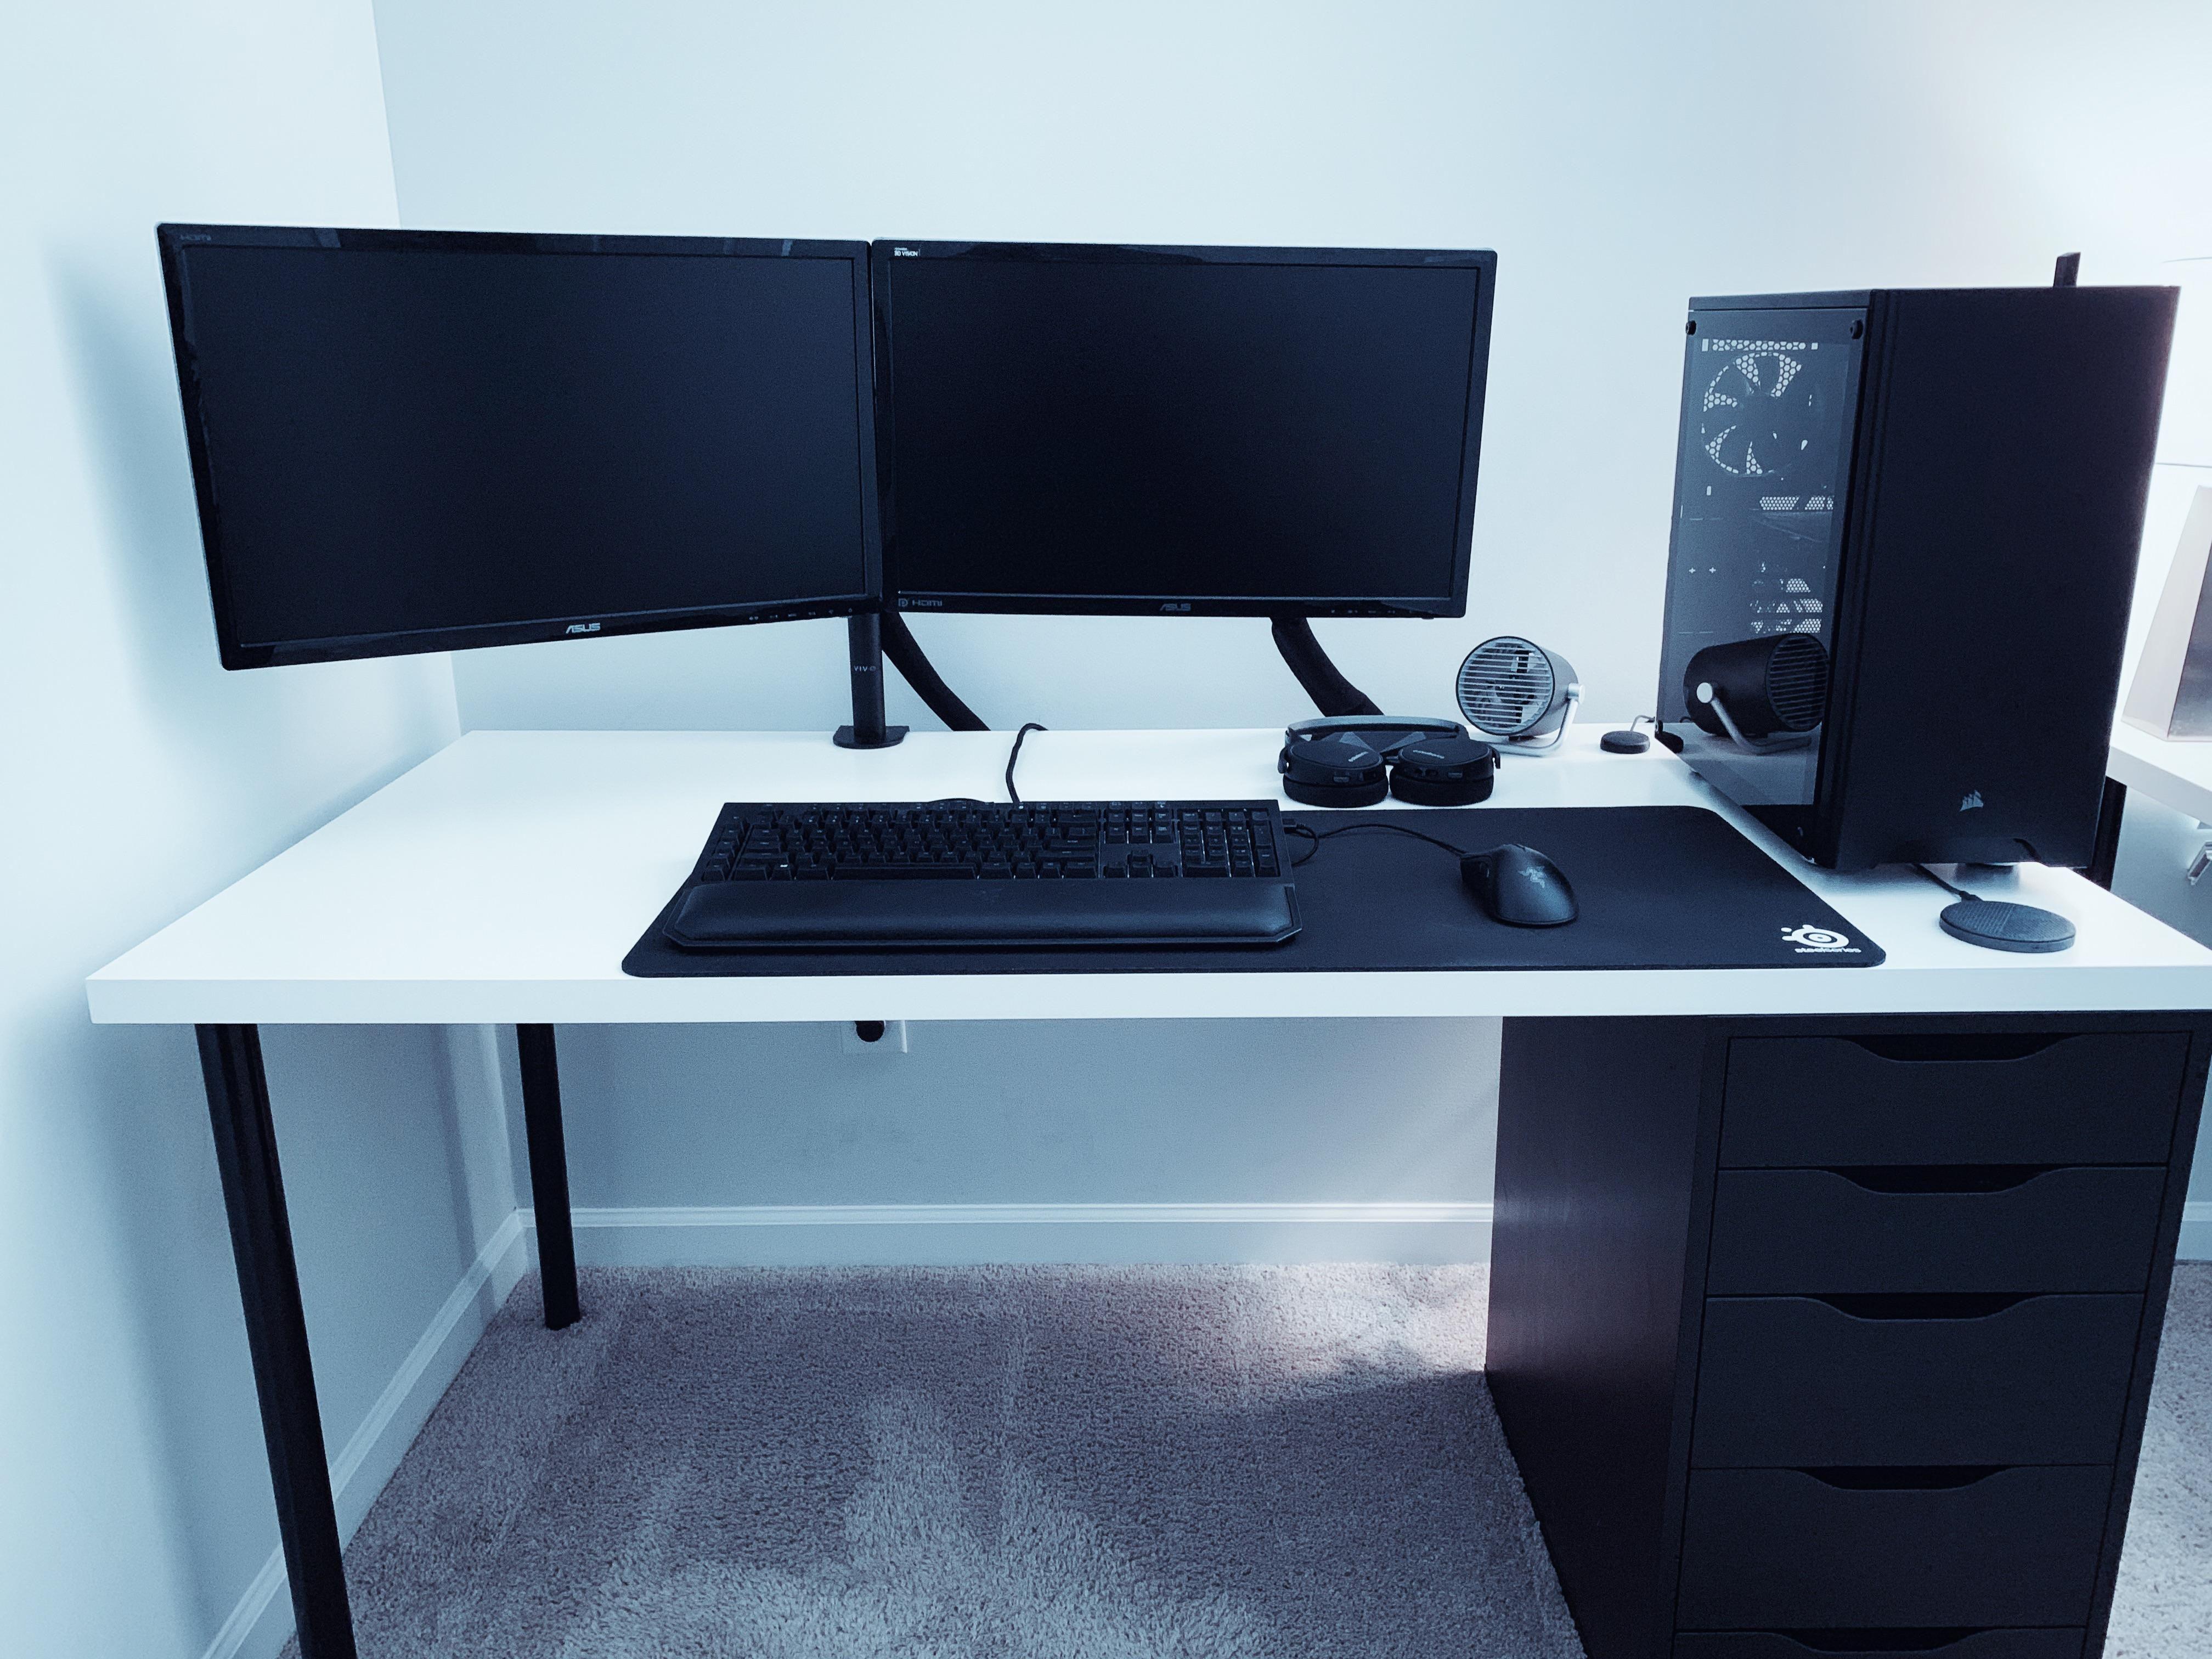 Posted W O Reading The Rules Reddit Noob So Heres My Setup Xd Home Office Setup Computer Desk Design Gaming Room Setup